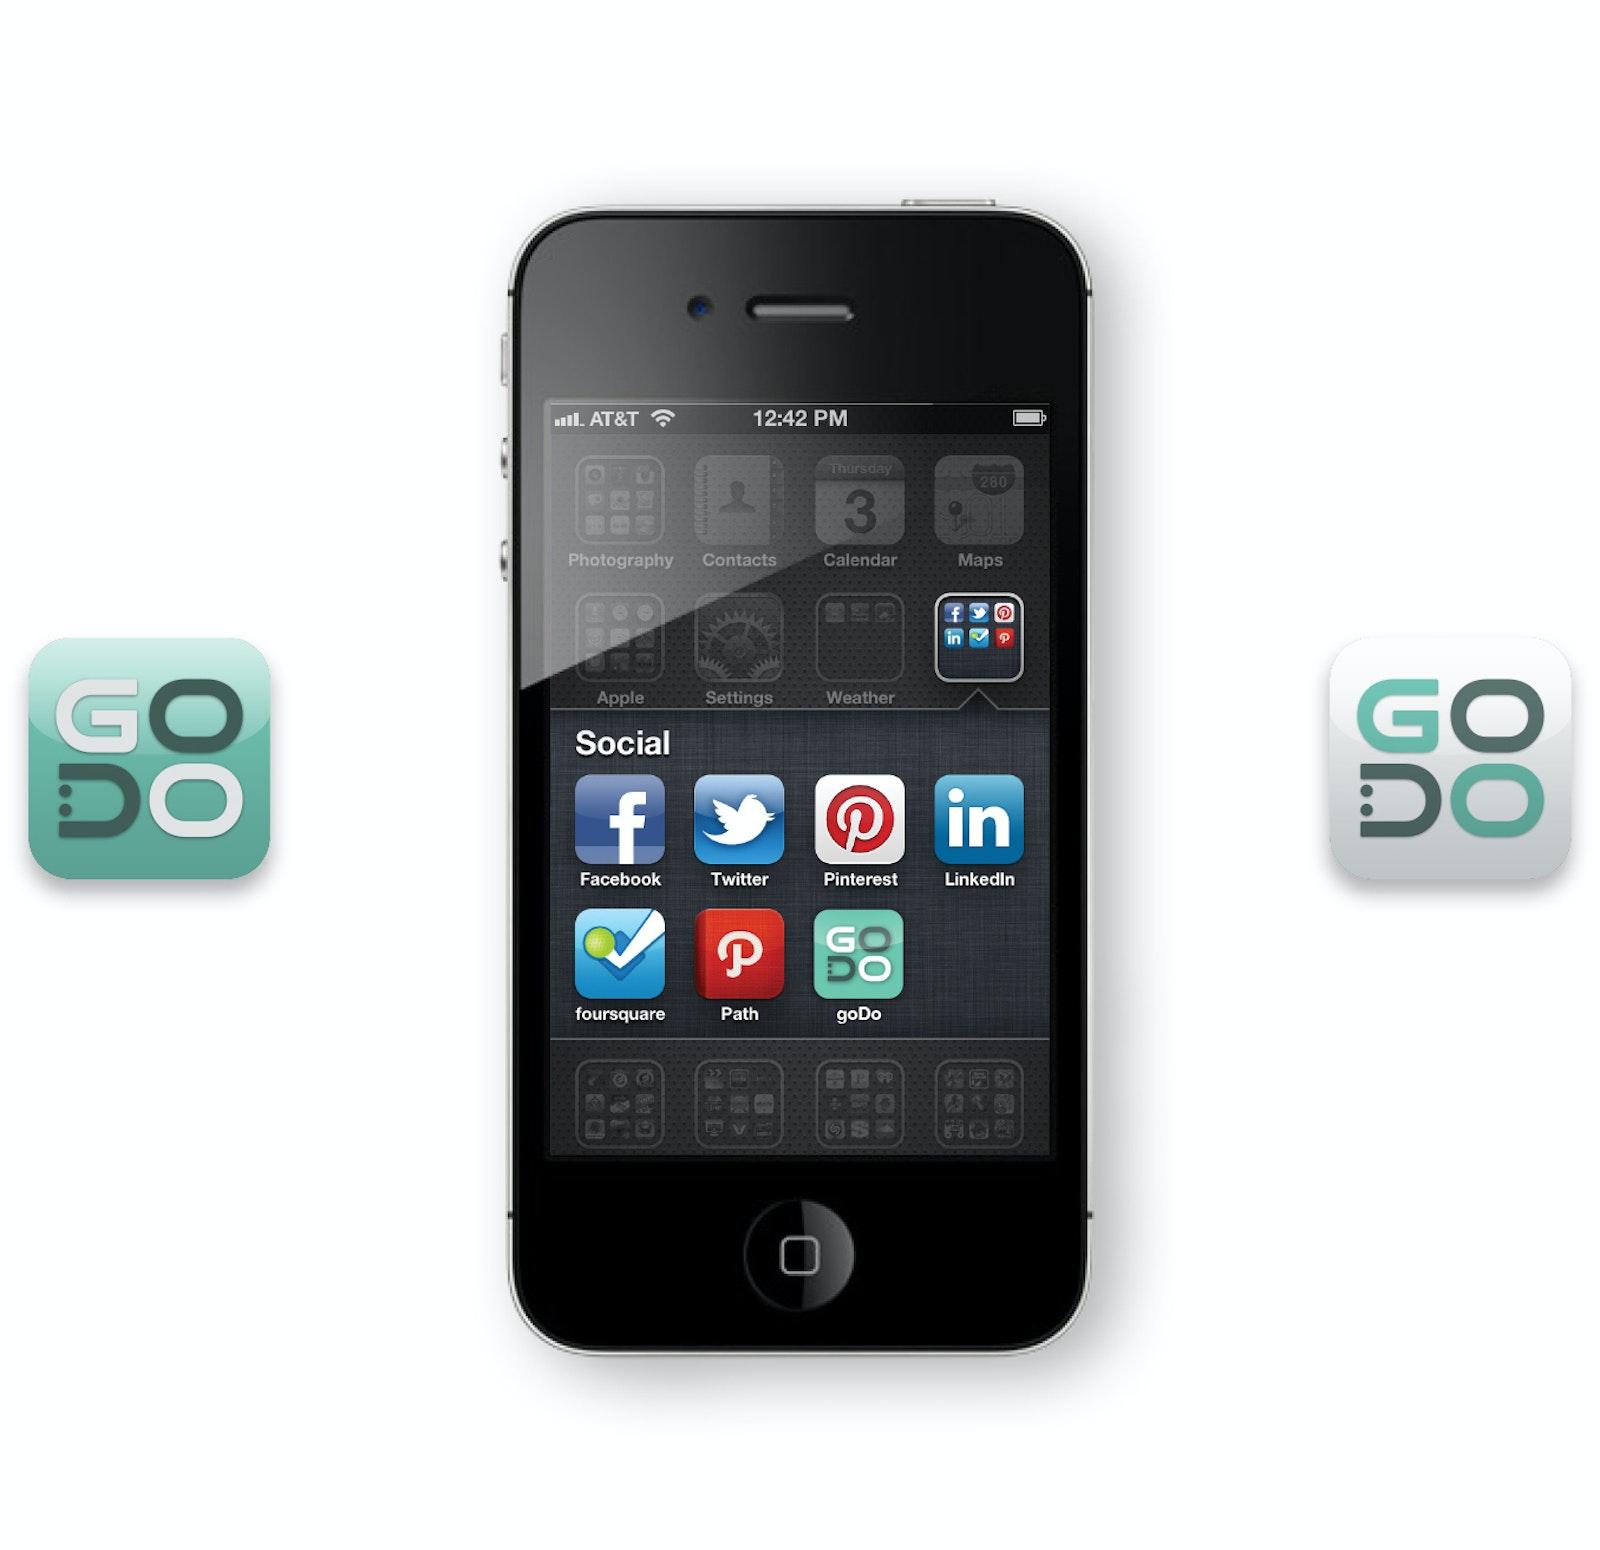 Godo app Icon